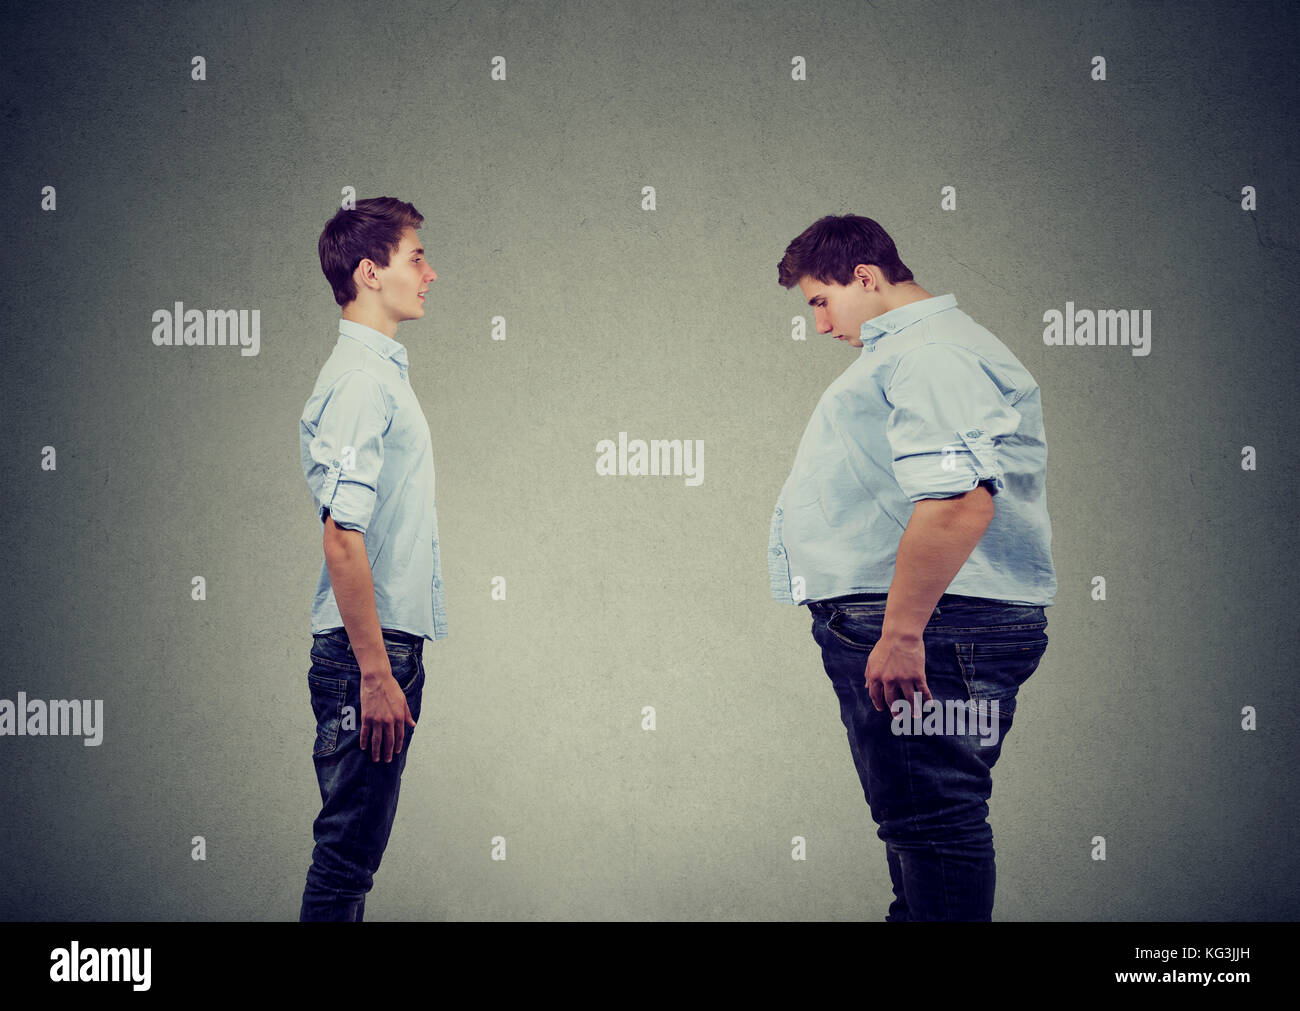 Junge slim fit Mann an Fett selbst suchen. Diät Wahl richtige Ernährung gesunder Lebensstil Konzept Stockbild